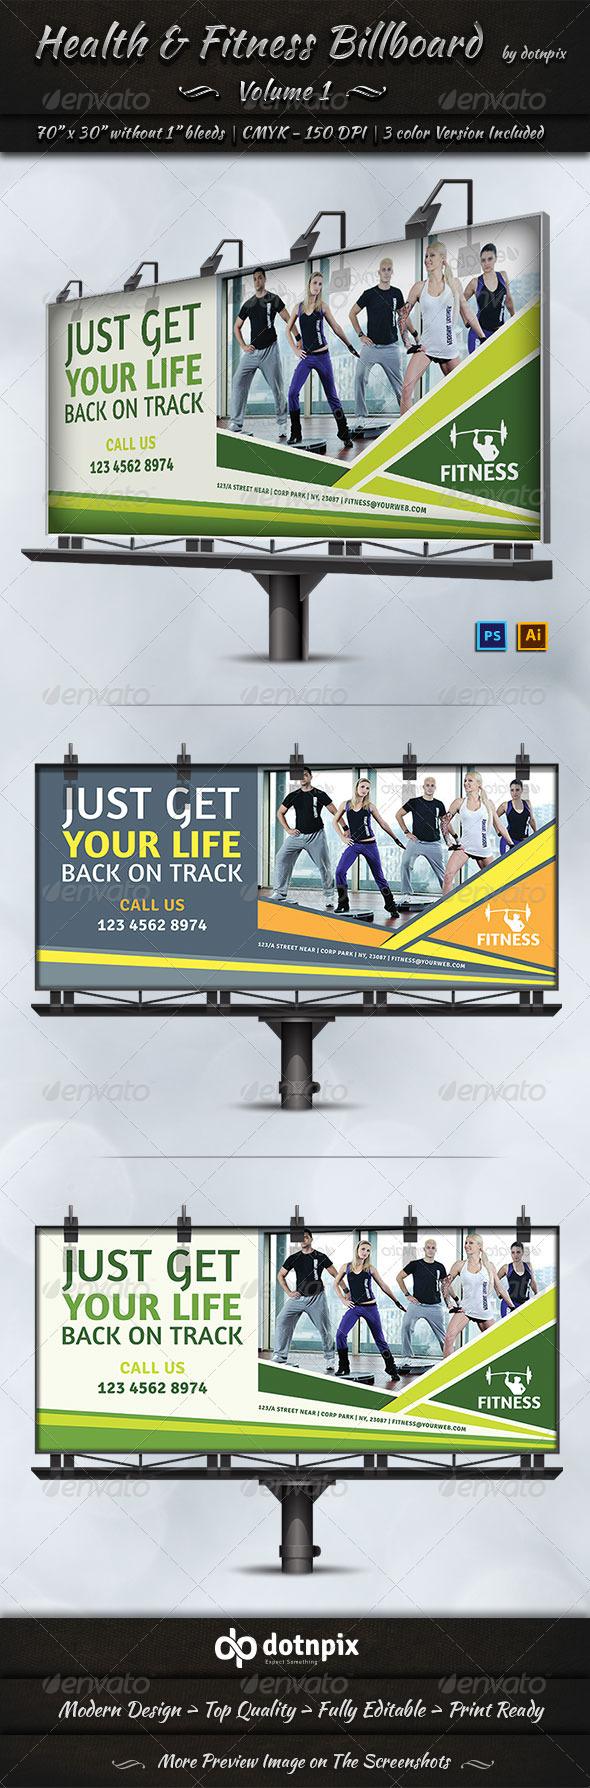 GraphicRiver Health & Fitness Billboard Template Volume 1 7778035